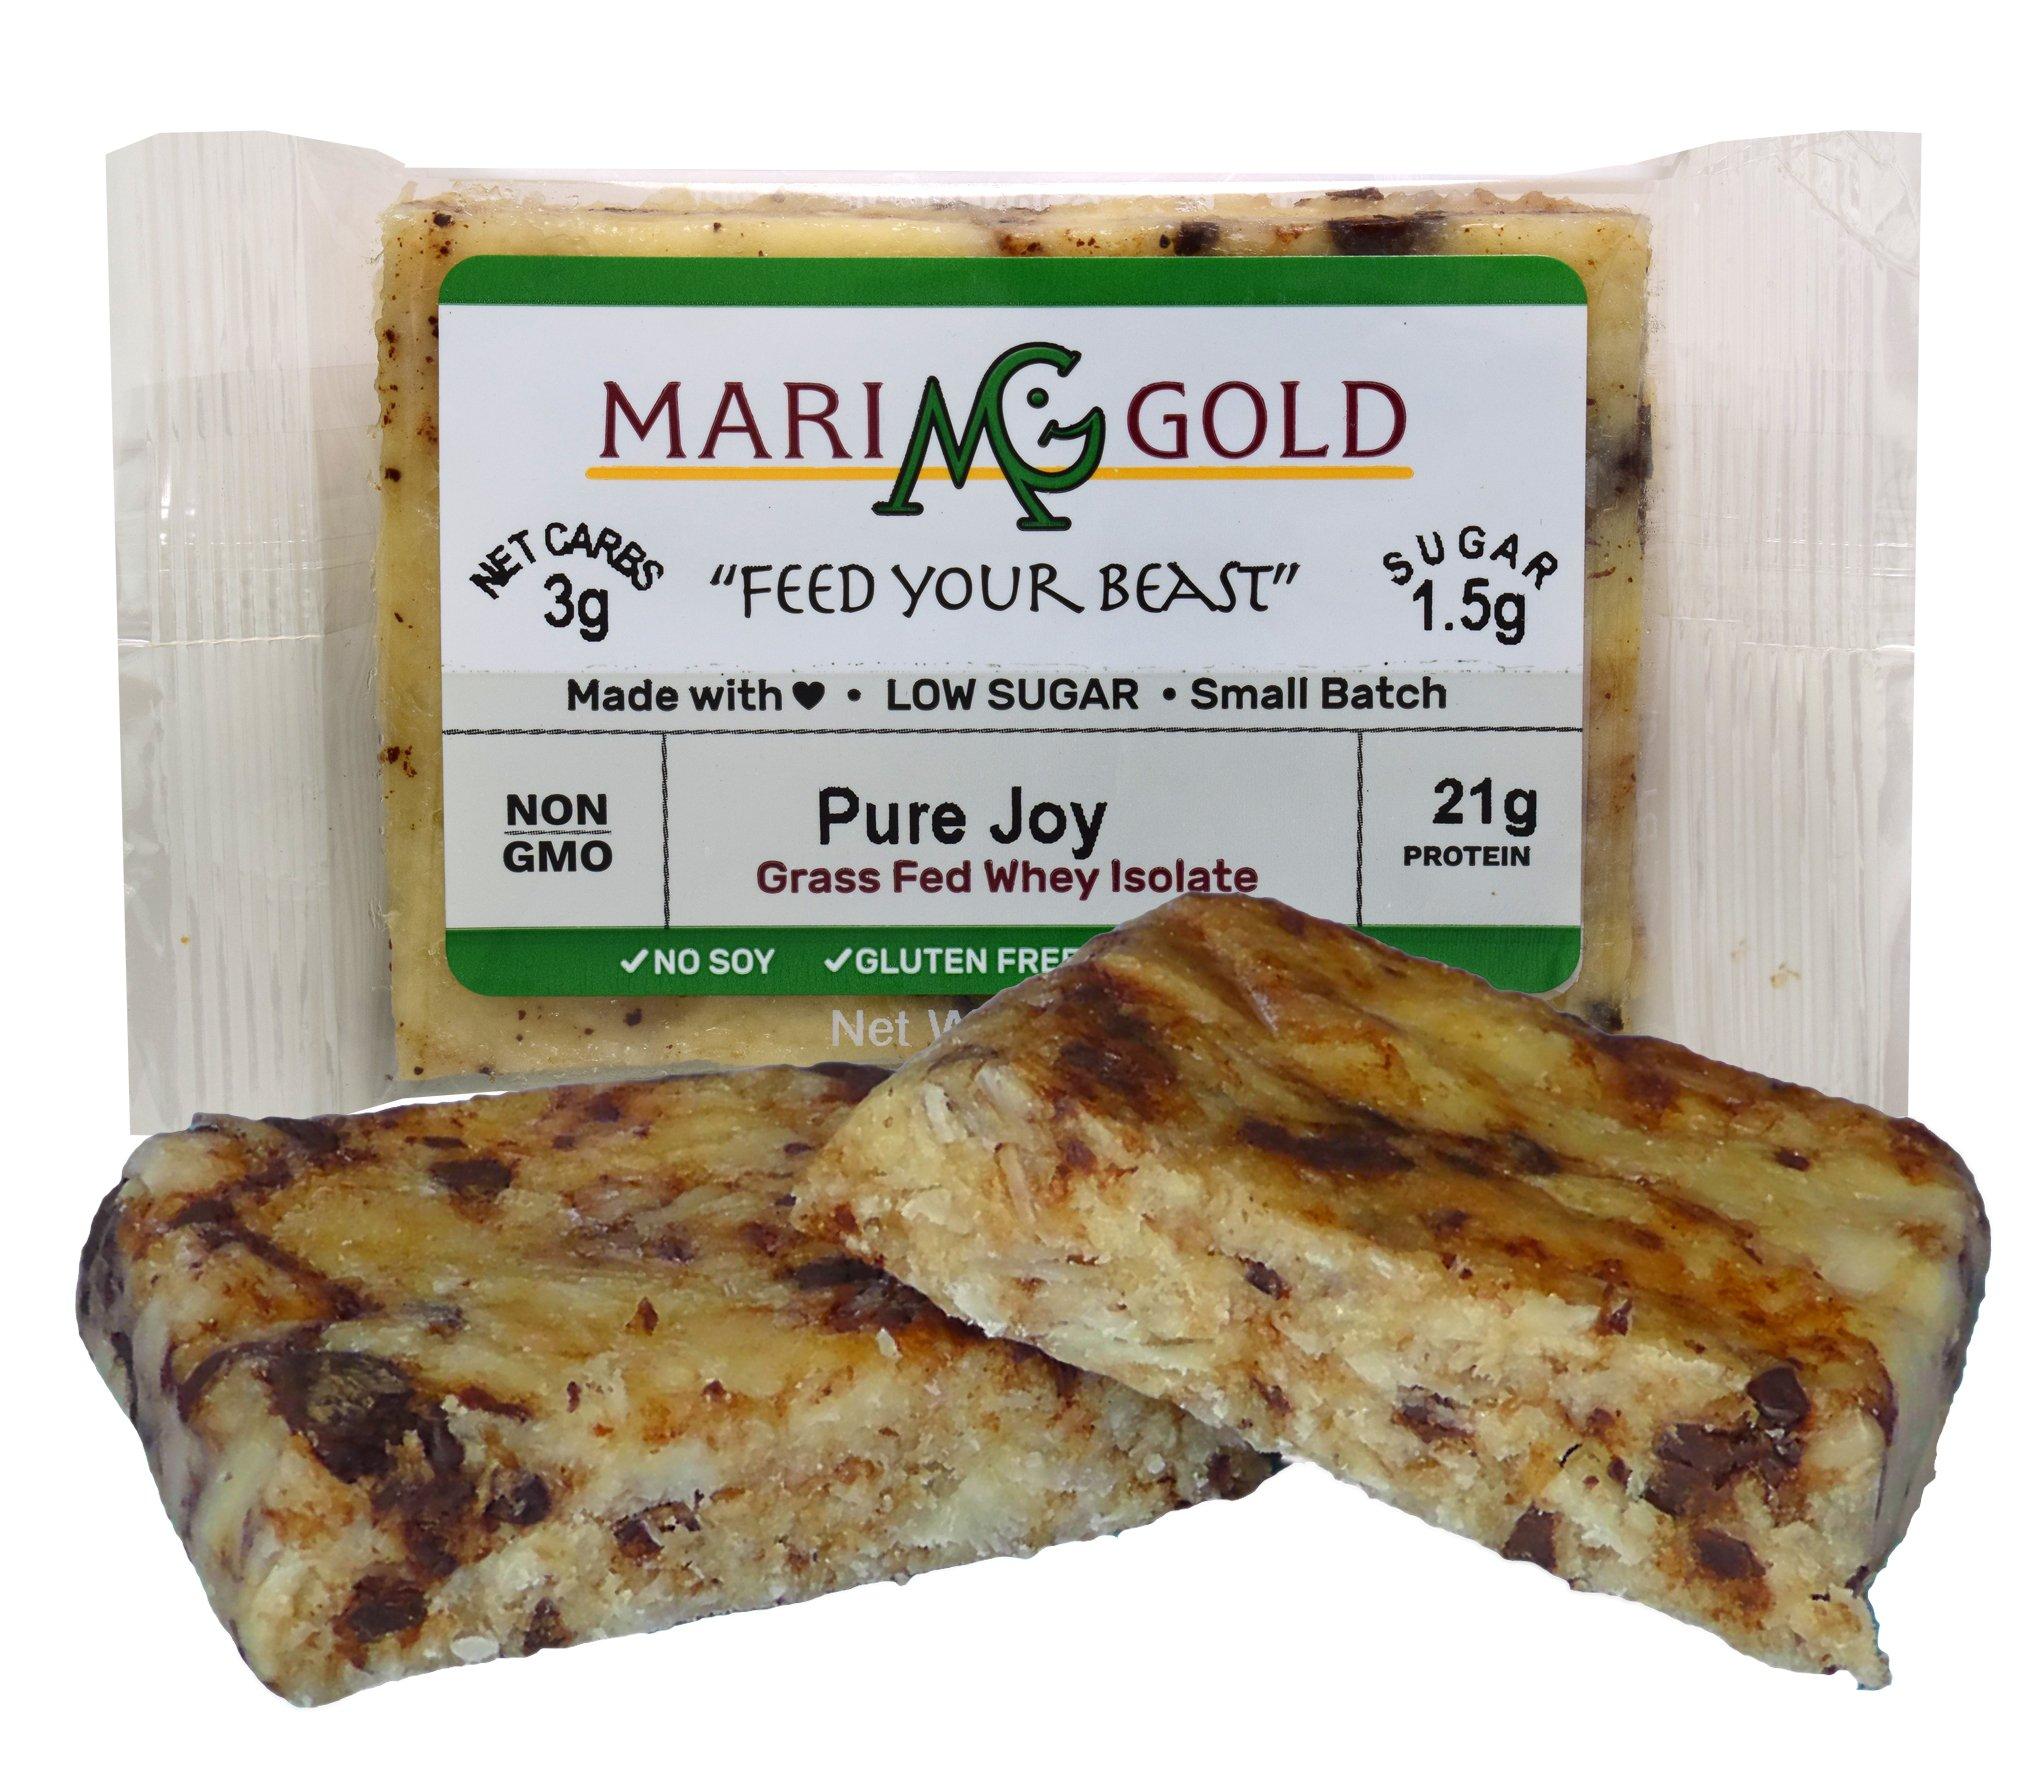 Keto (2-3 NET CARB) Protein Bar by MariGold - Amazing Taste Ketogenic Snacks - Organic Fats, 1 g Sugar, 21 g Protein GRASS FED Whey - Non GMO. Made Fresh, Ships Fresh. (12 bars) by MariGold Bars (Image #8)